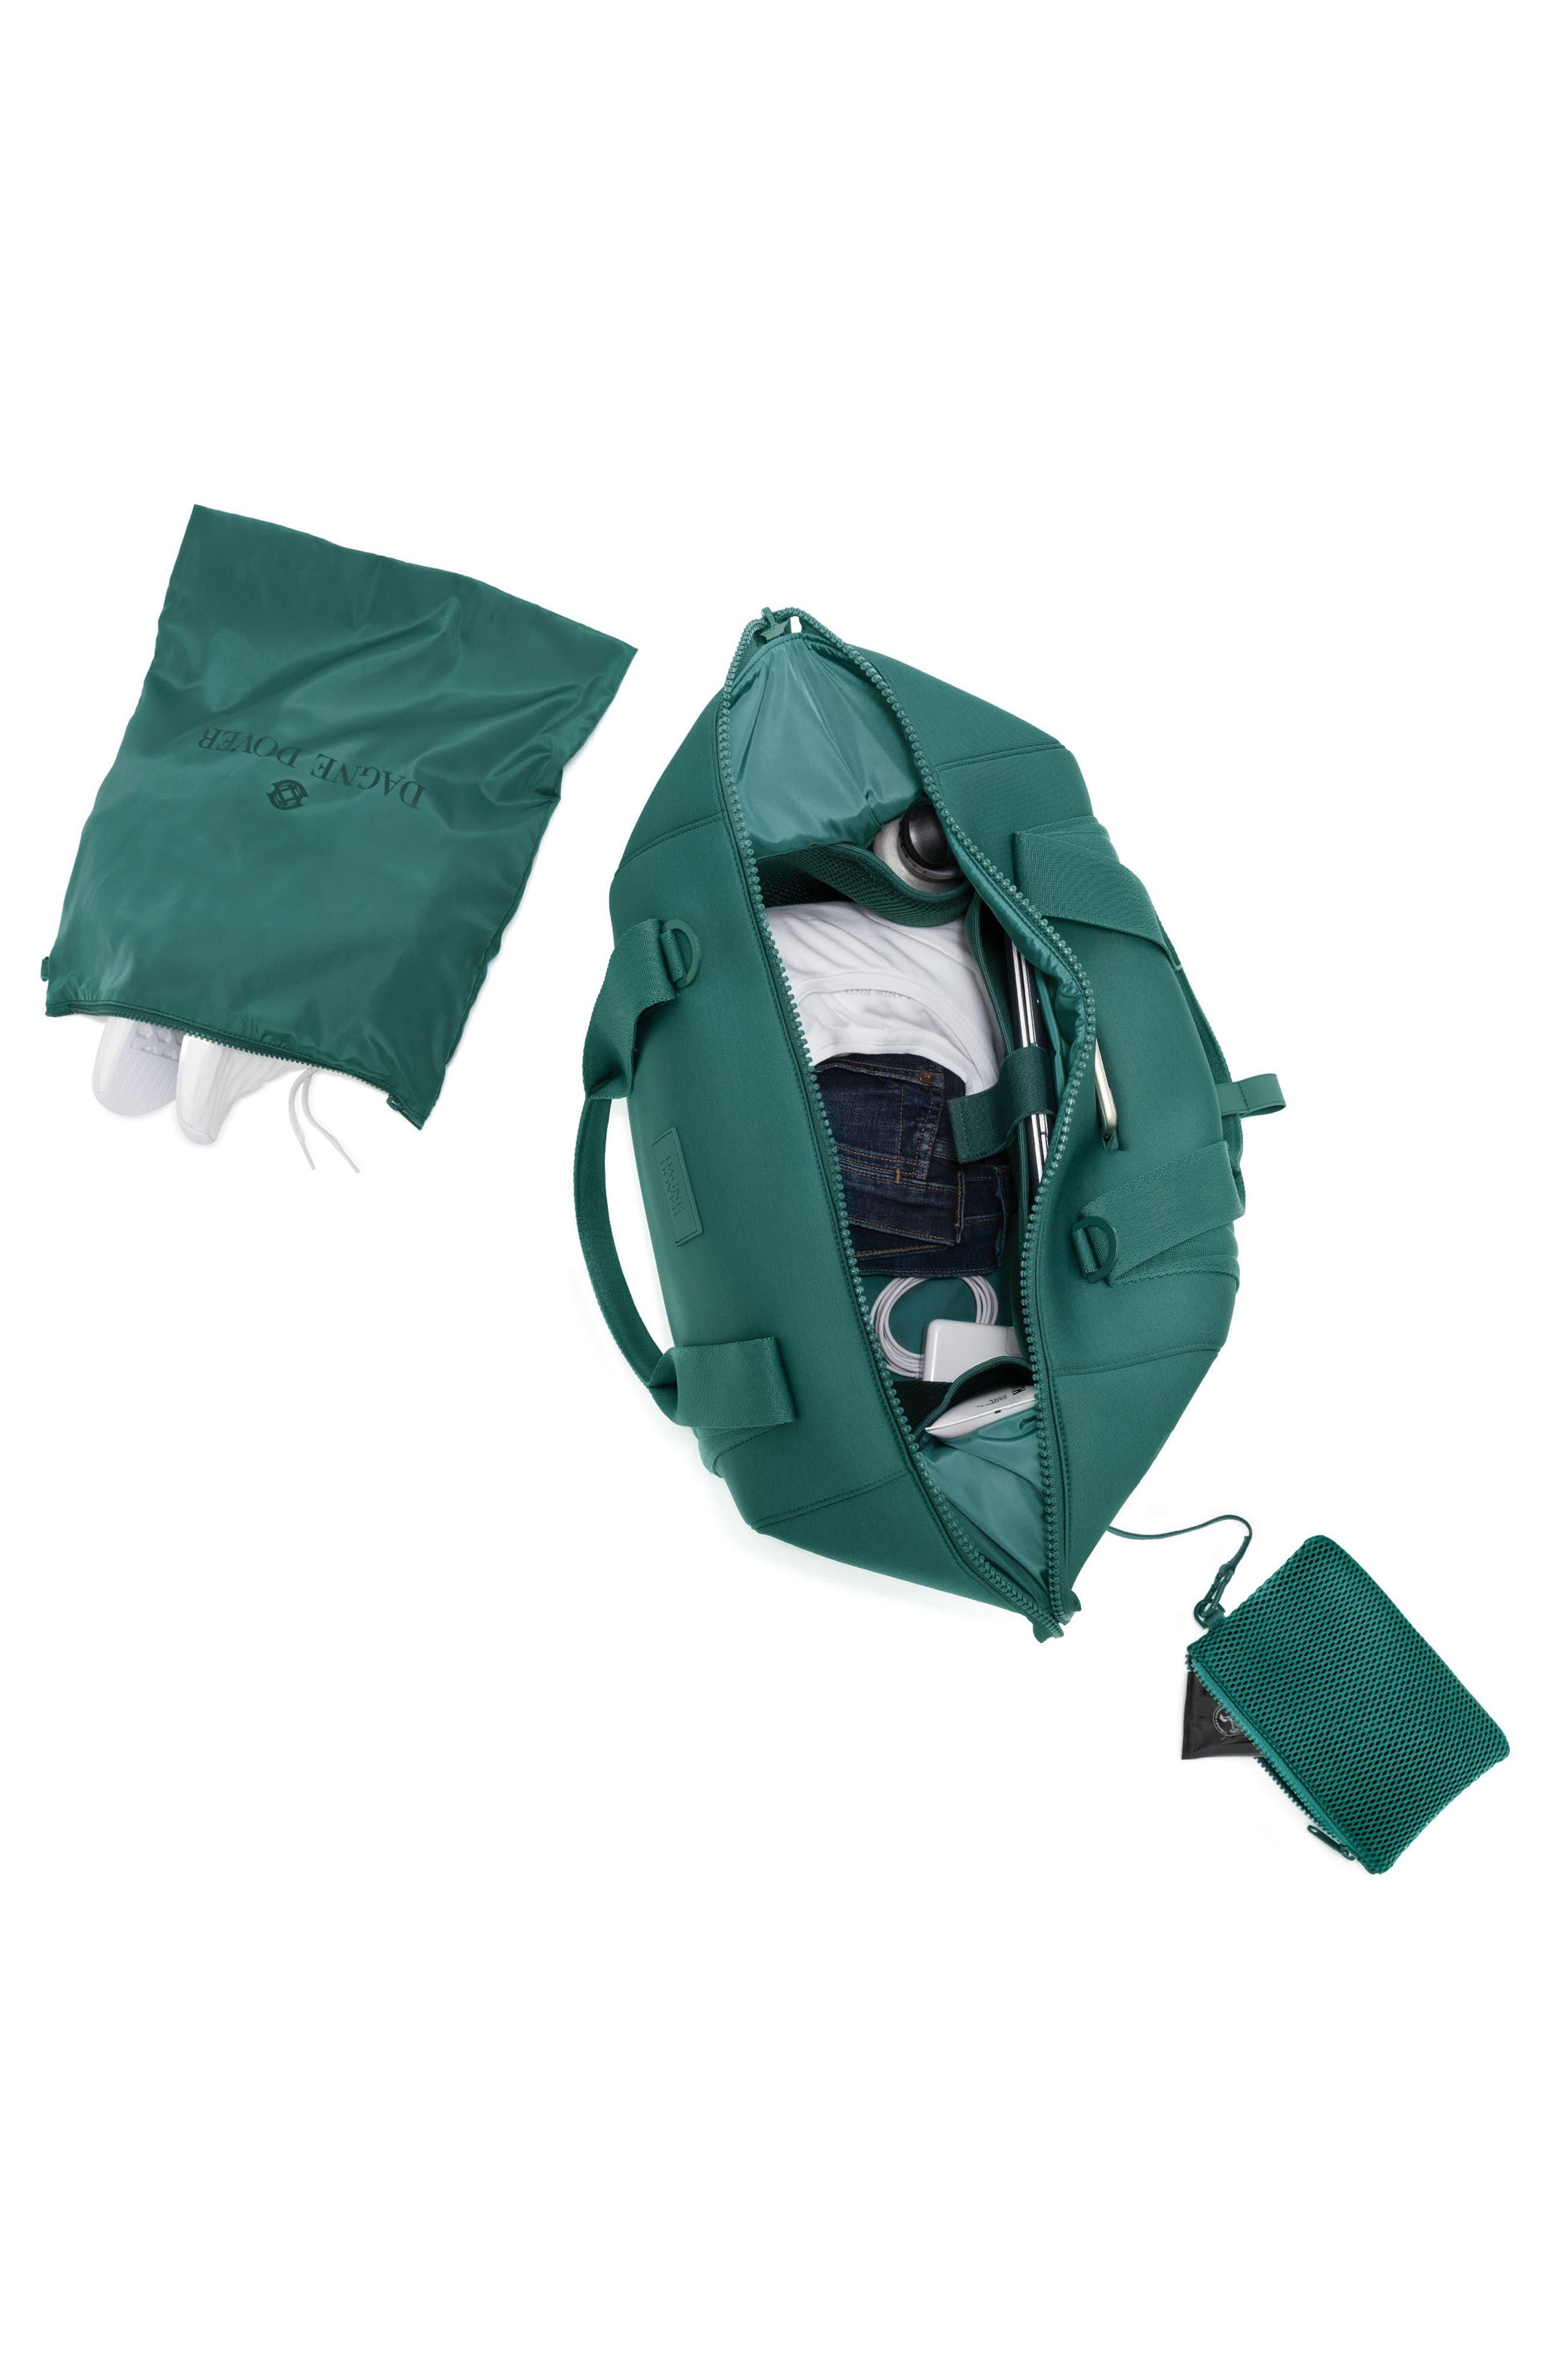 365 Large Landon Neoprene Carryall Duffel Bag,                             Alternate thumbnail 15, color,